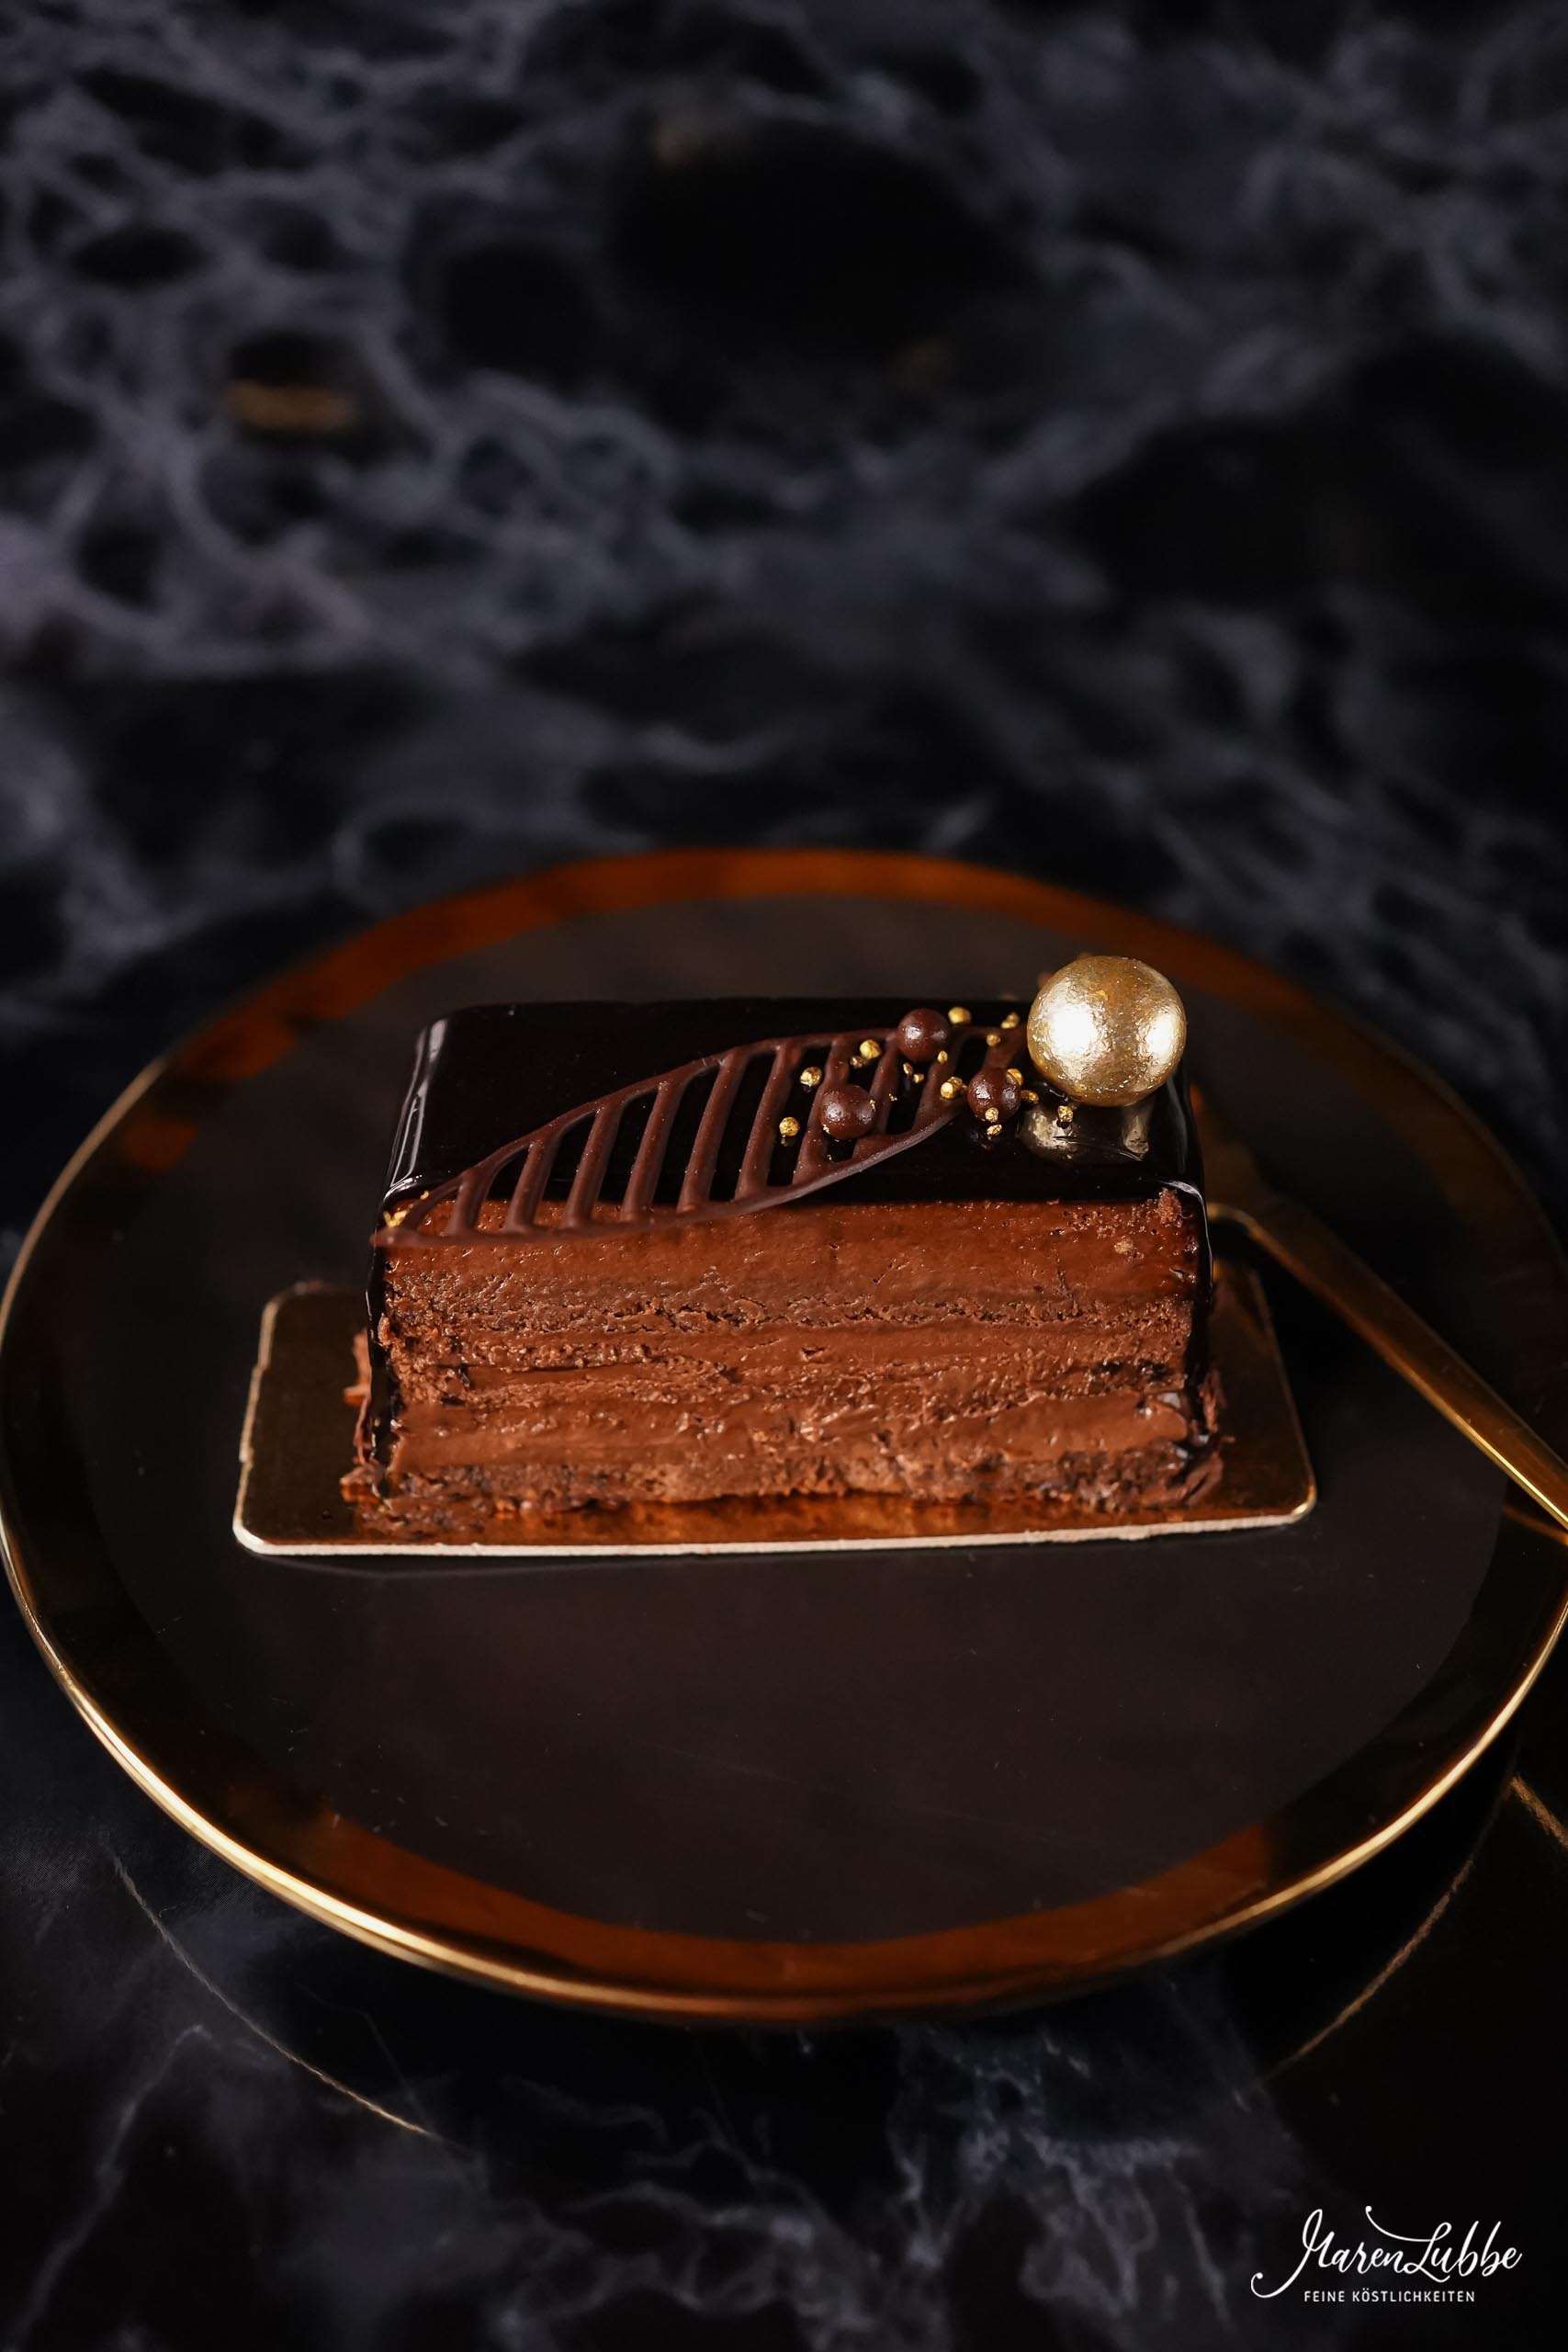 Élegance - Feinste Schokoladenschnitten